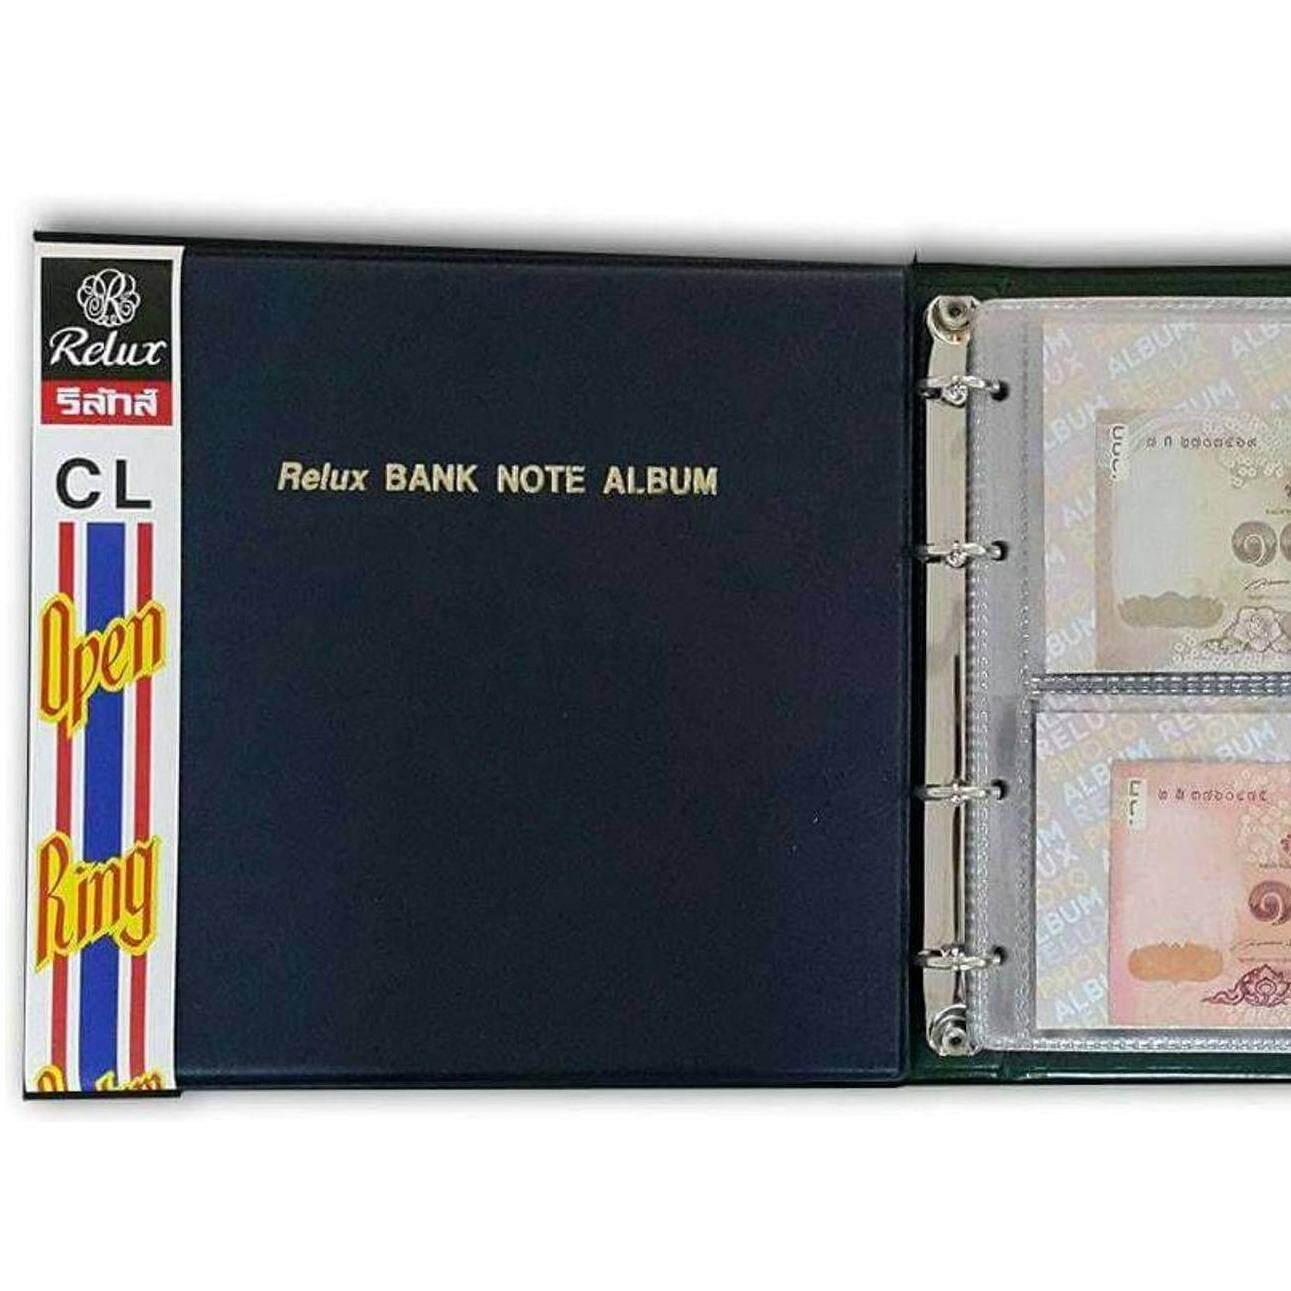 RELUX สมุดสะสมธนบัตร40 ฉบับ ปกหนังอย่างดีไส้หนาพิเศษ เพิ่มไส้ได้ BN-21 จำนวน 1 เล่ม